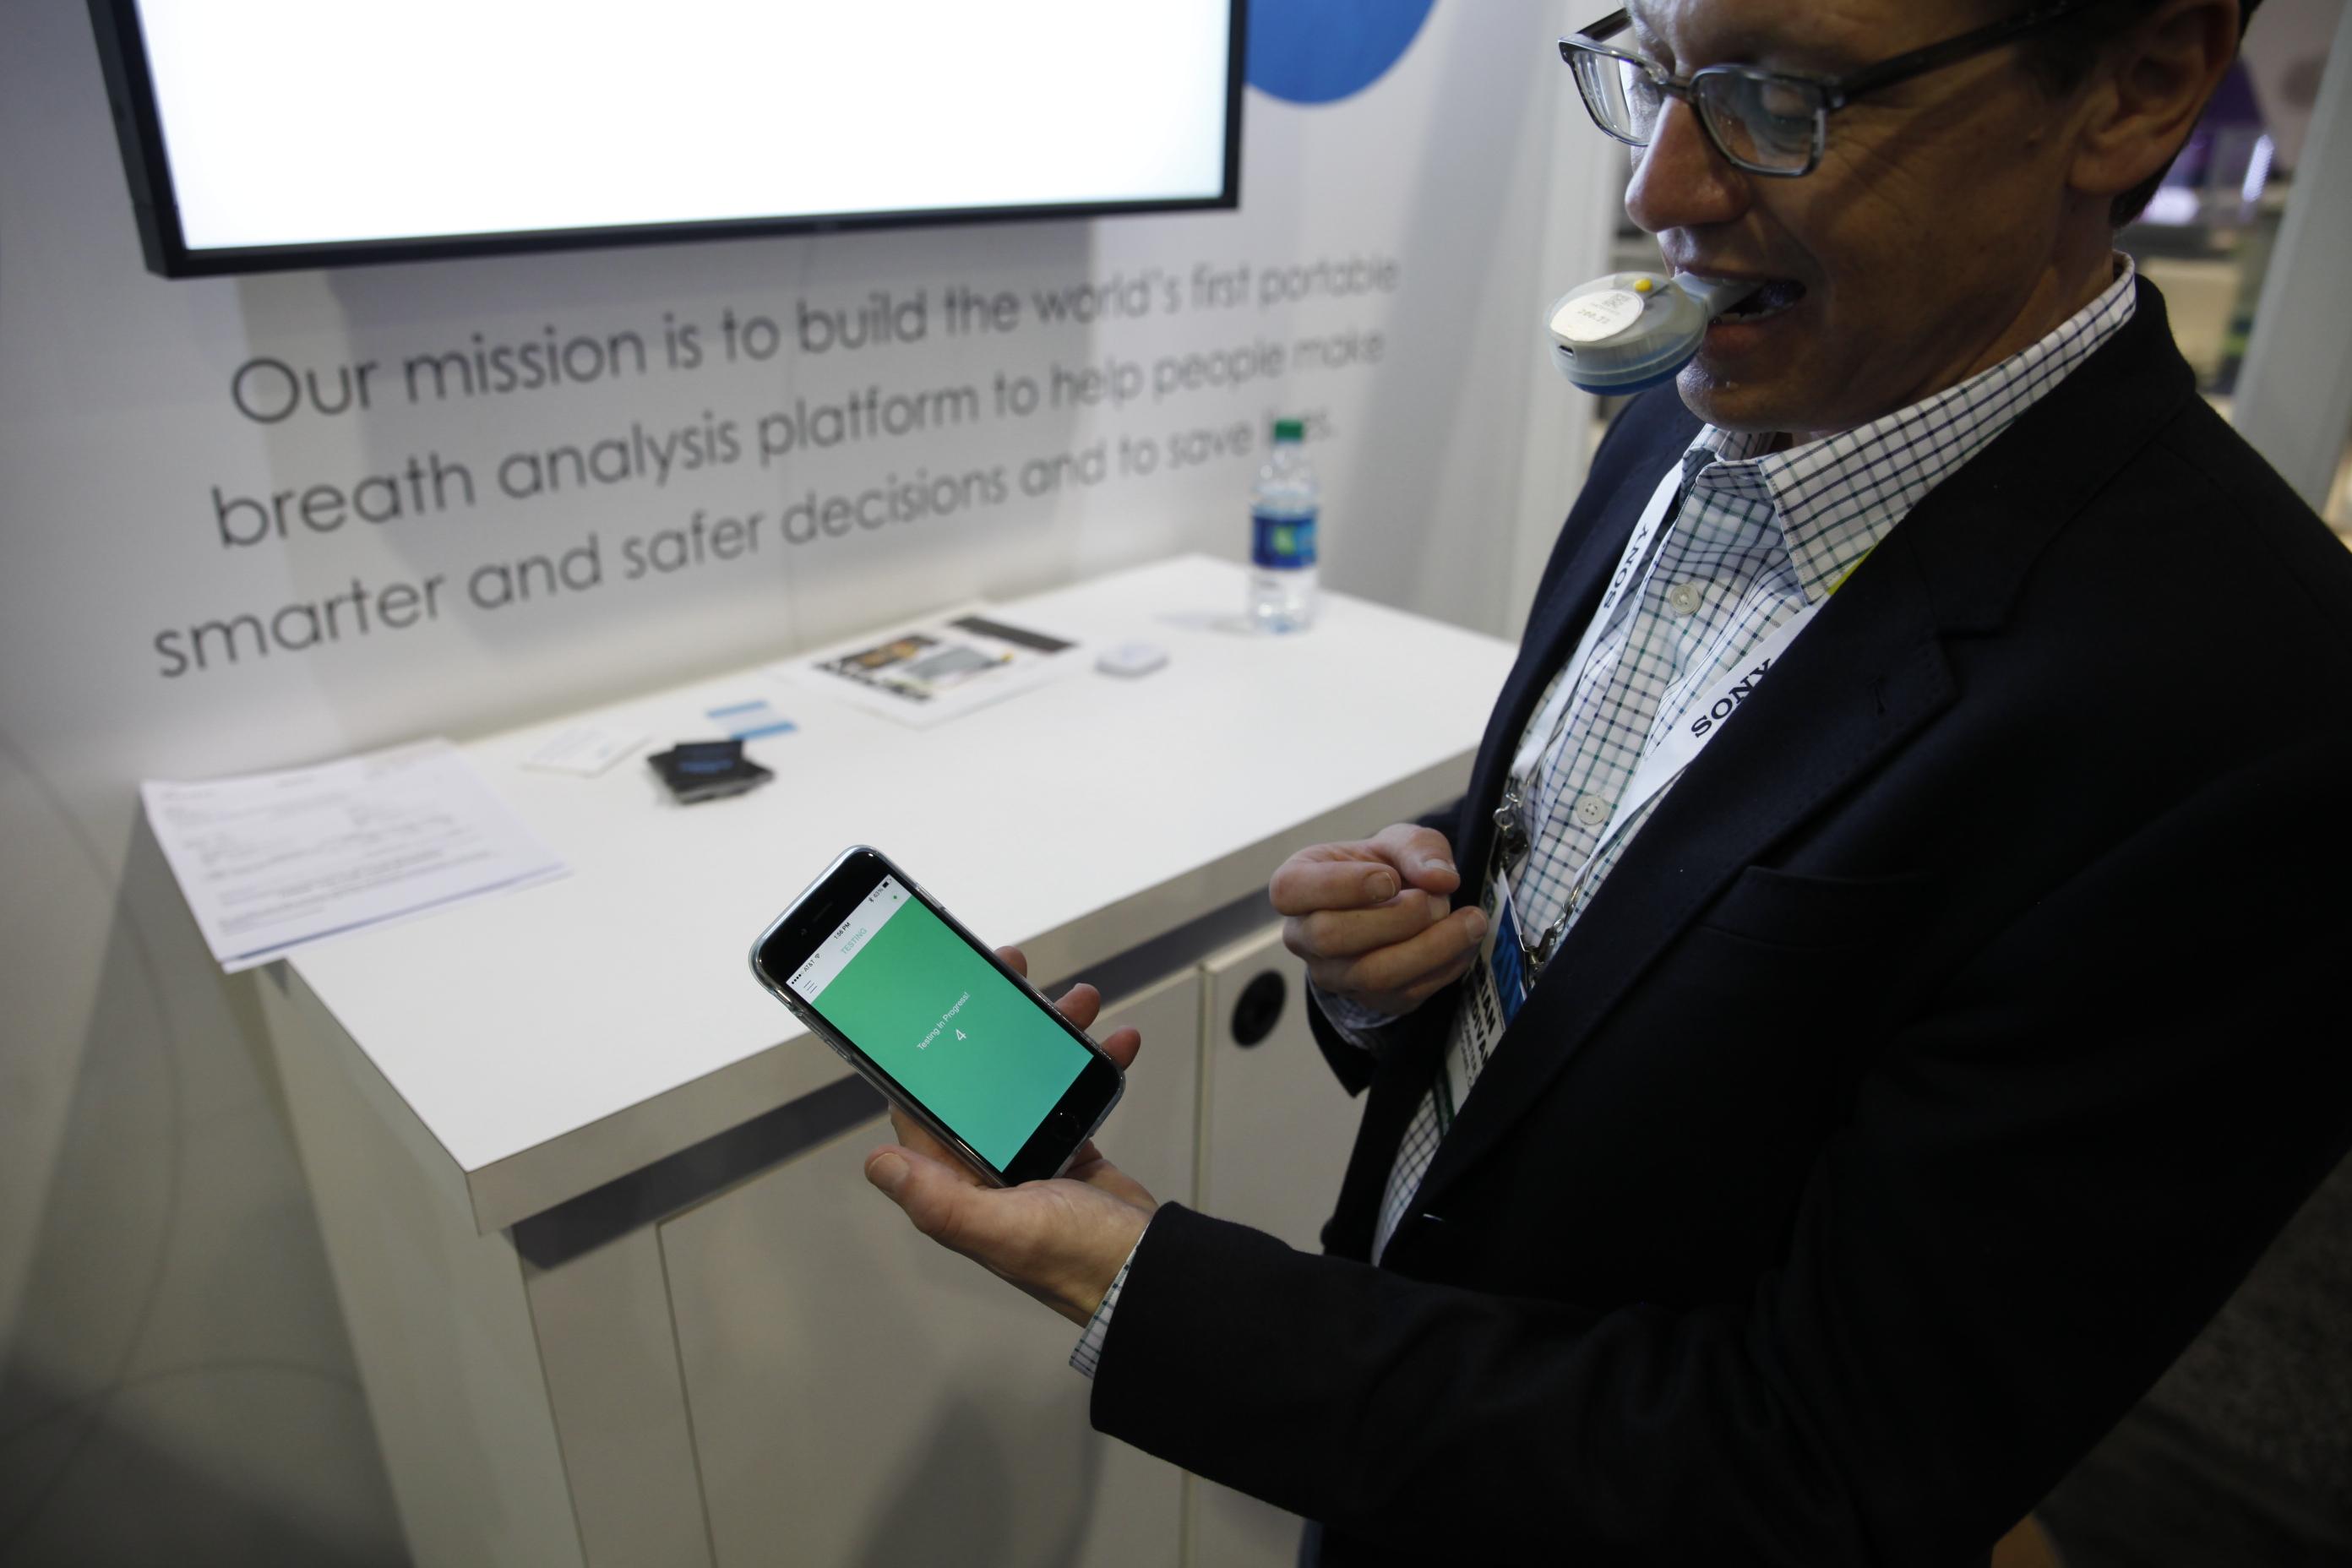 Breathometer mint CES 2015 demonstration prototype